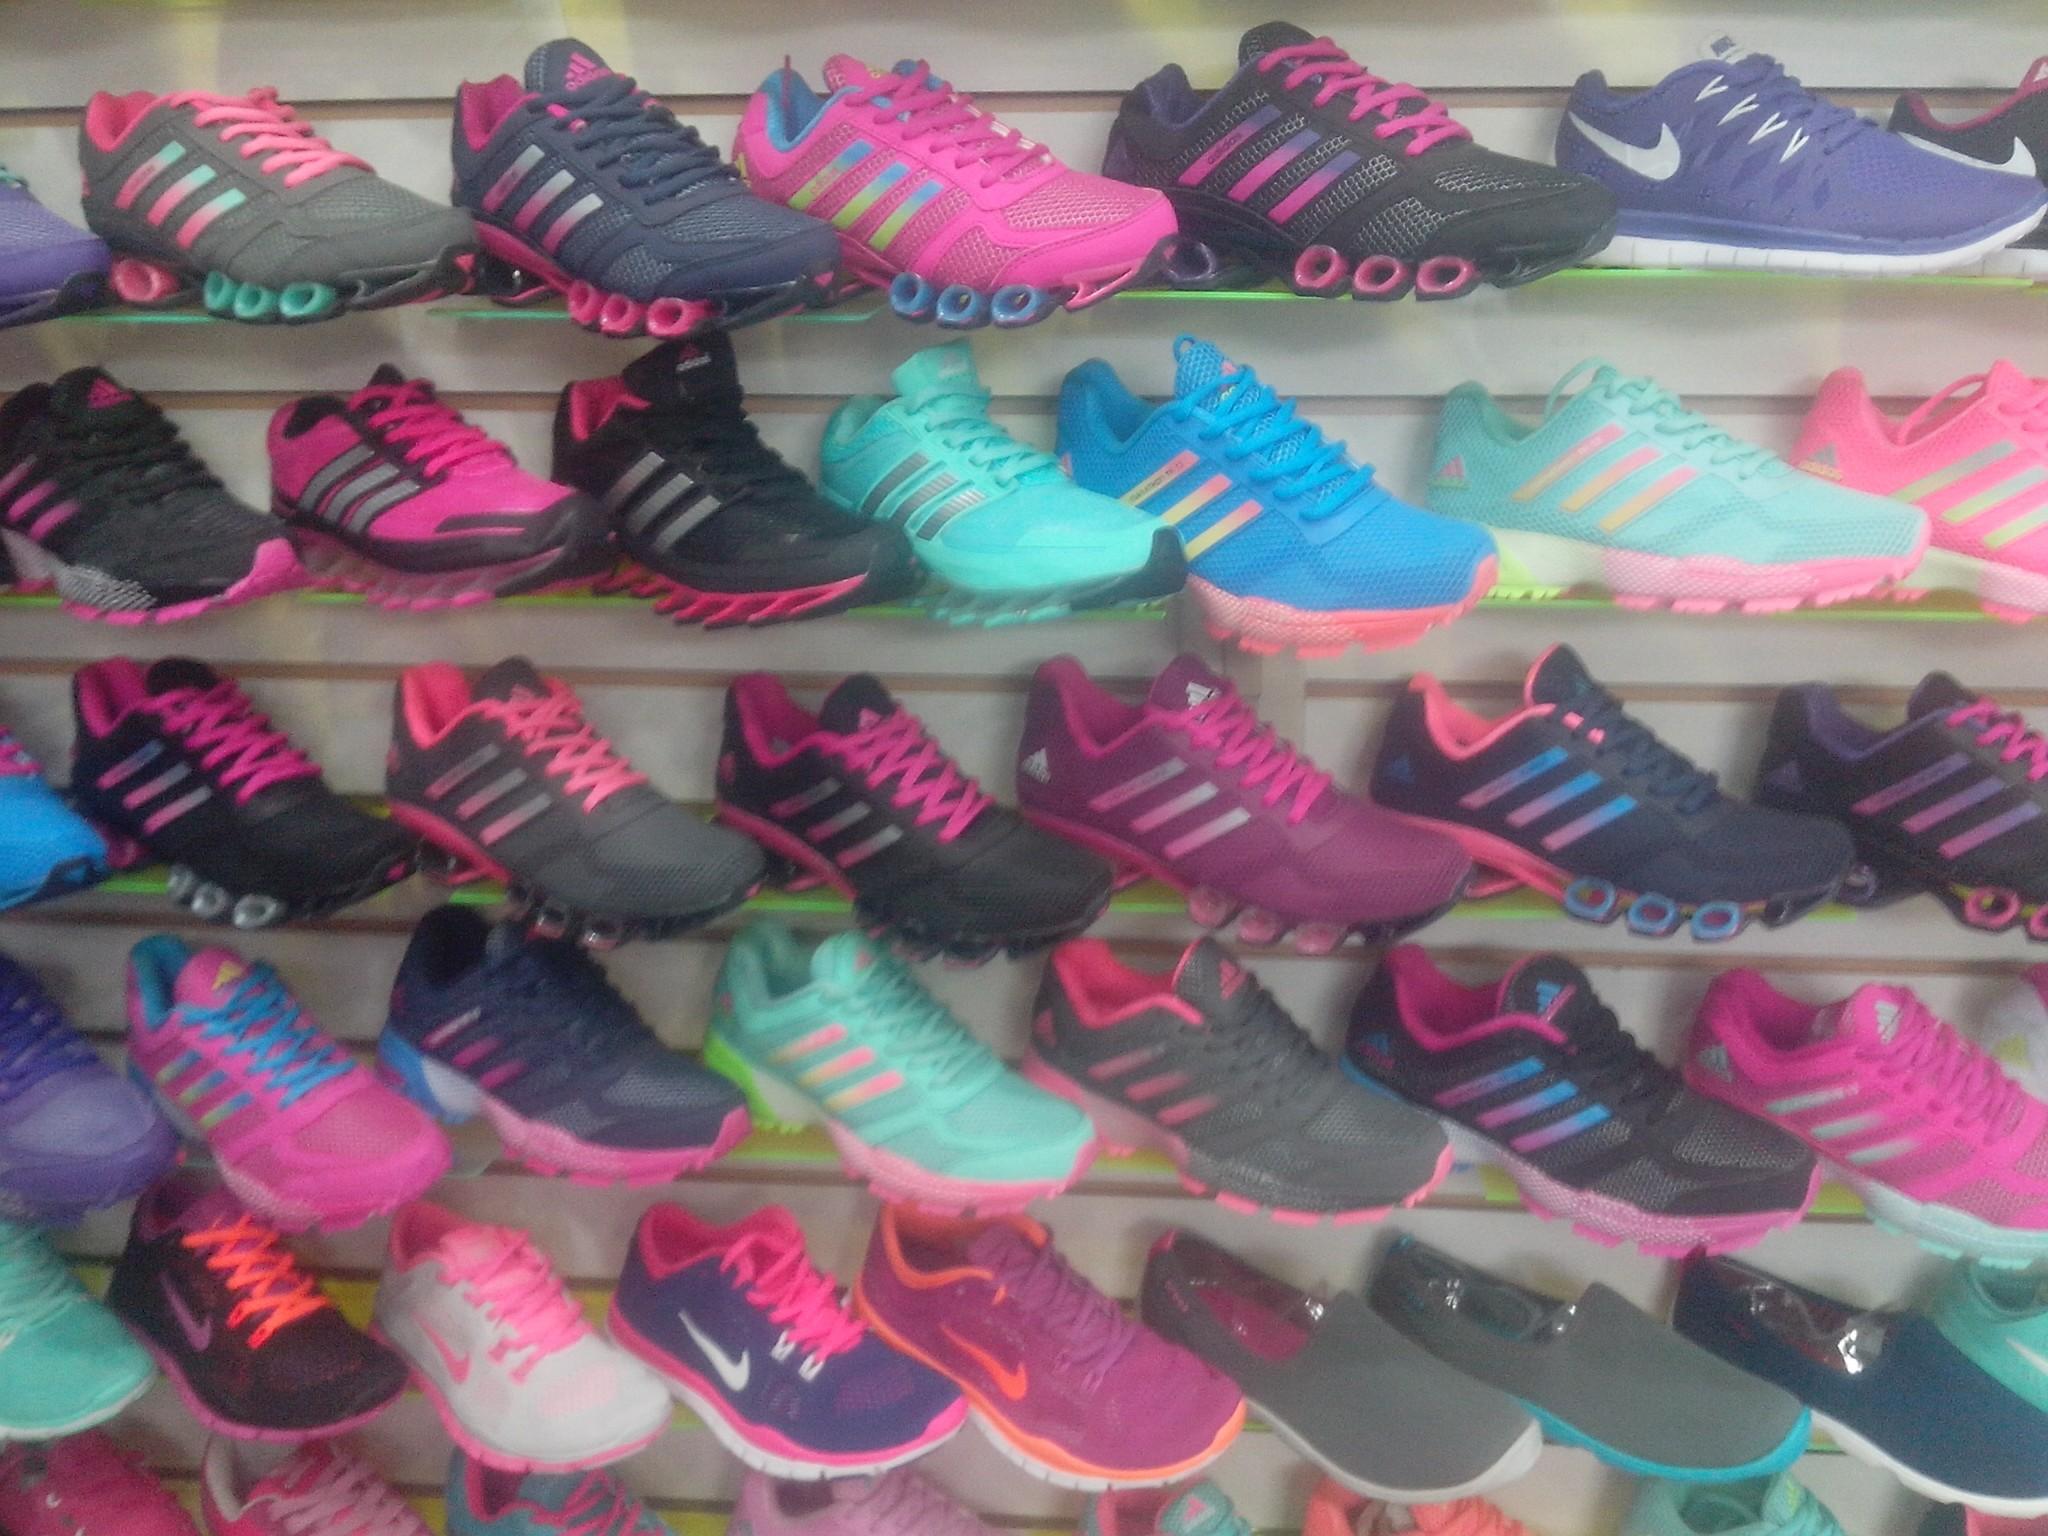 cd0eb638bba7d nike colombia tienda online - Santillana CompartirSantillana Compartir